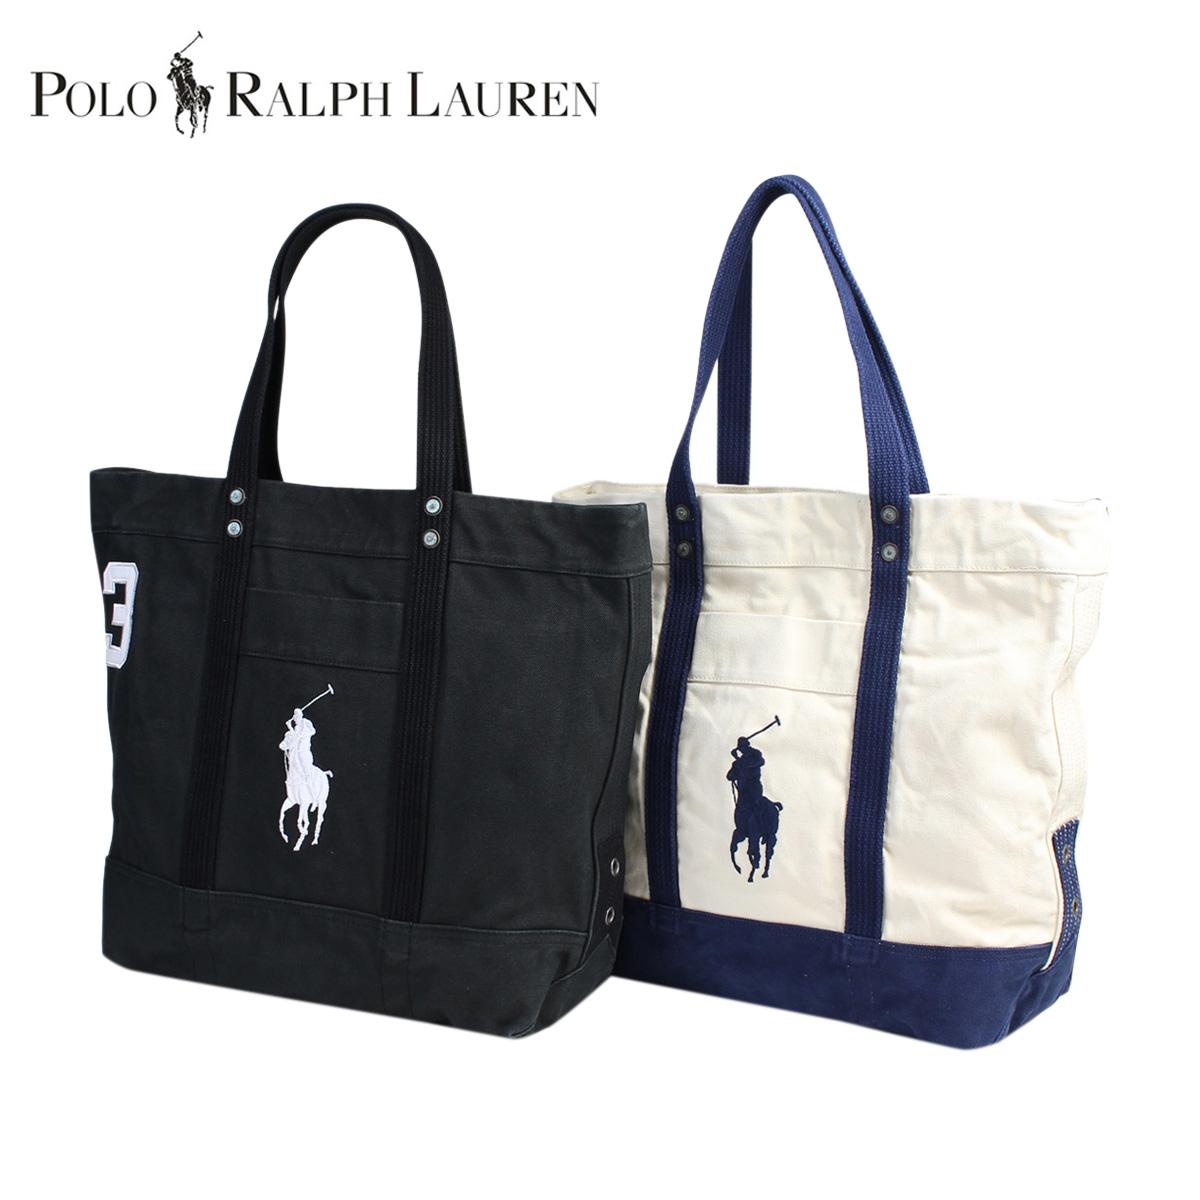 Big Pony Color Tote Polo Bag Gap Men Dis Ralph 2 Lauren 0w8nOvmN